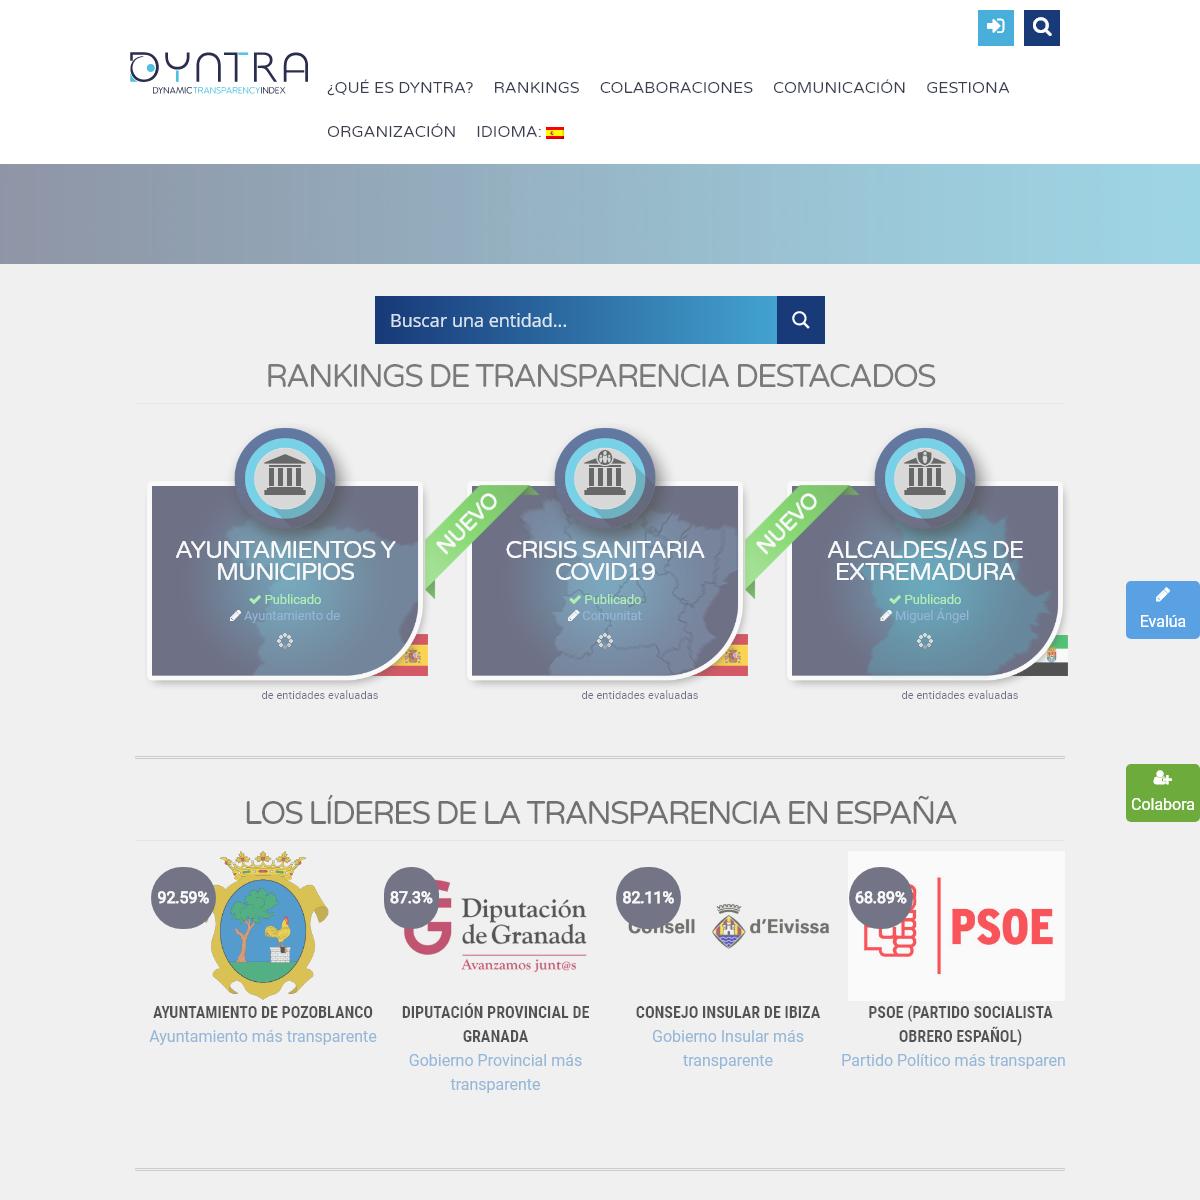 Dyntra, Dynamic Transparency Index